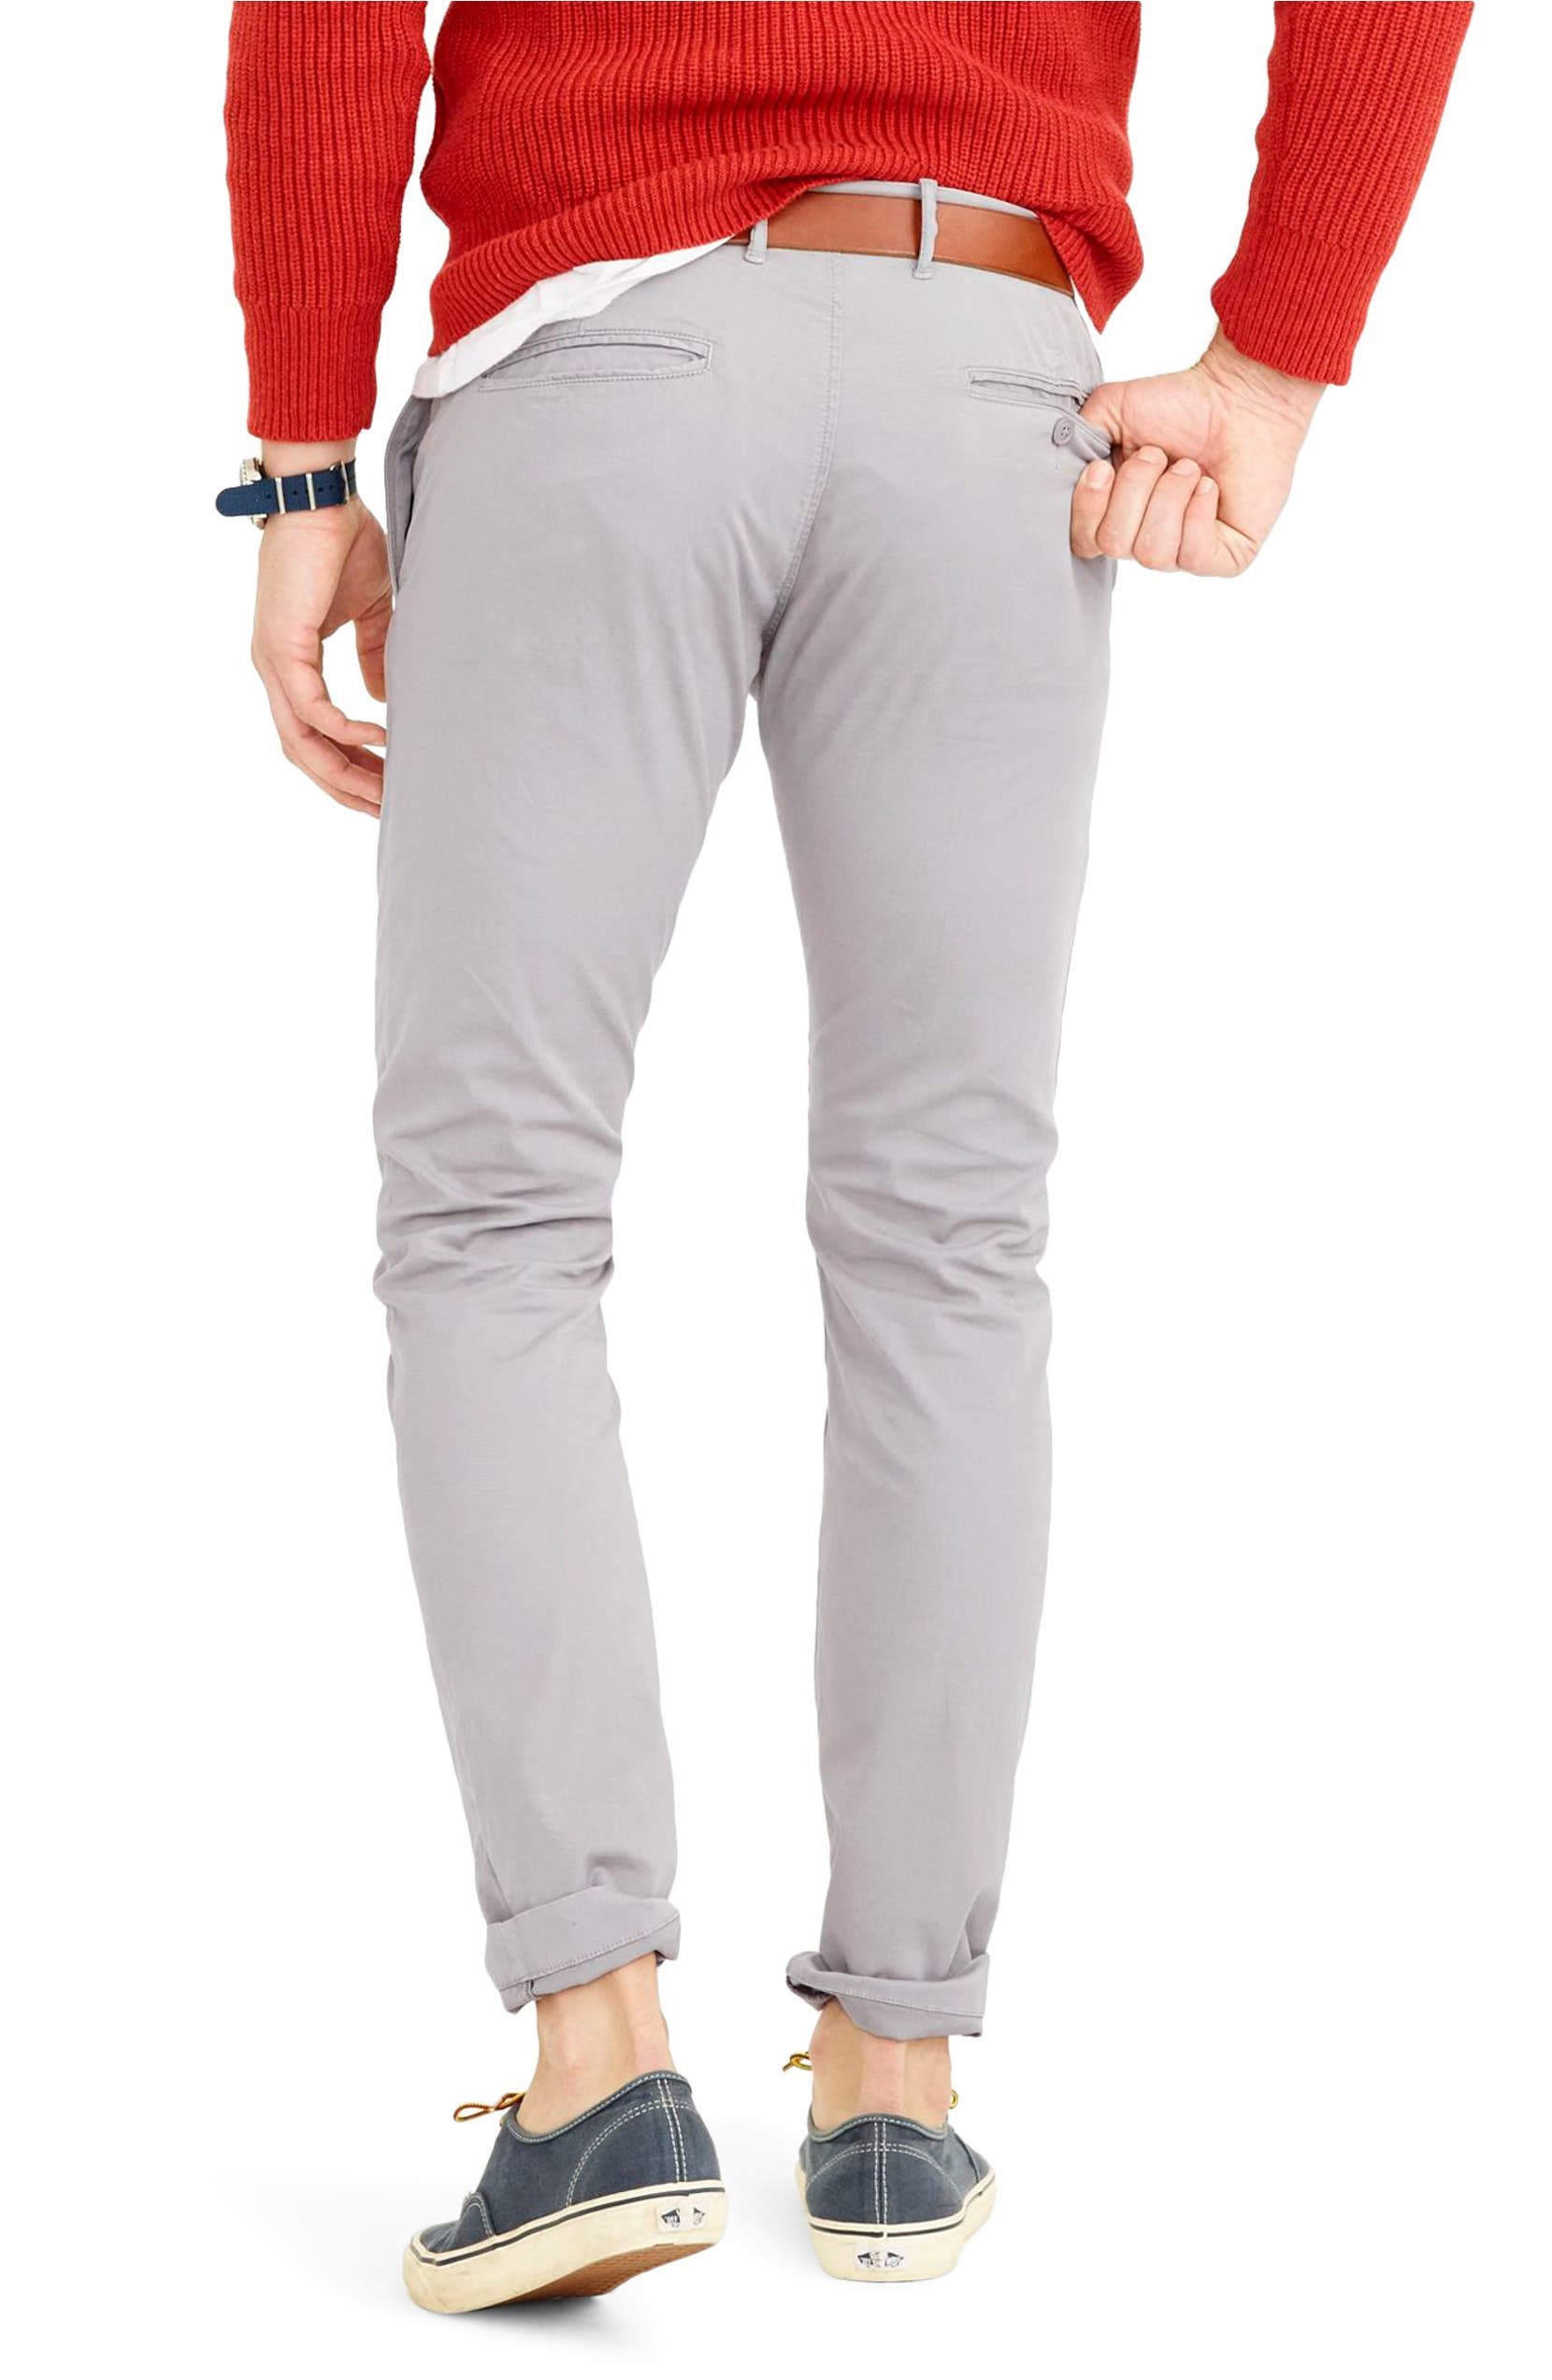 bba6b80cc88893 J.Crew Slim Fit Garment Dyed Stretch Chinos   Nordstrom